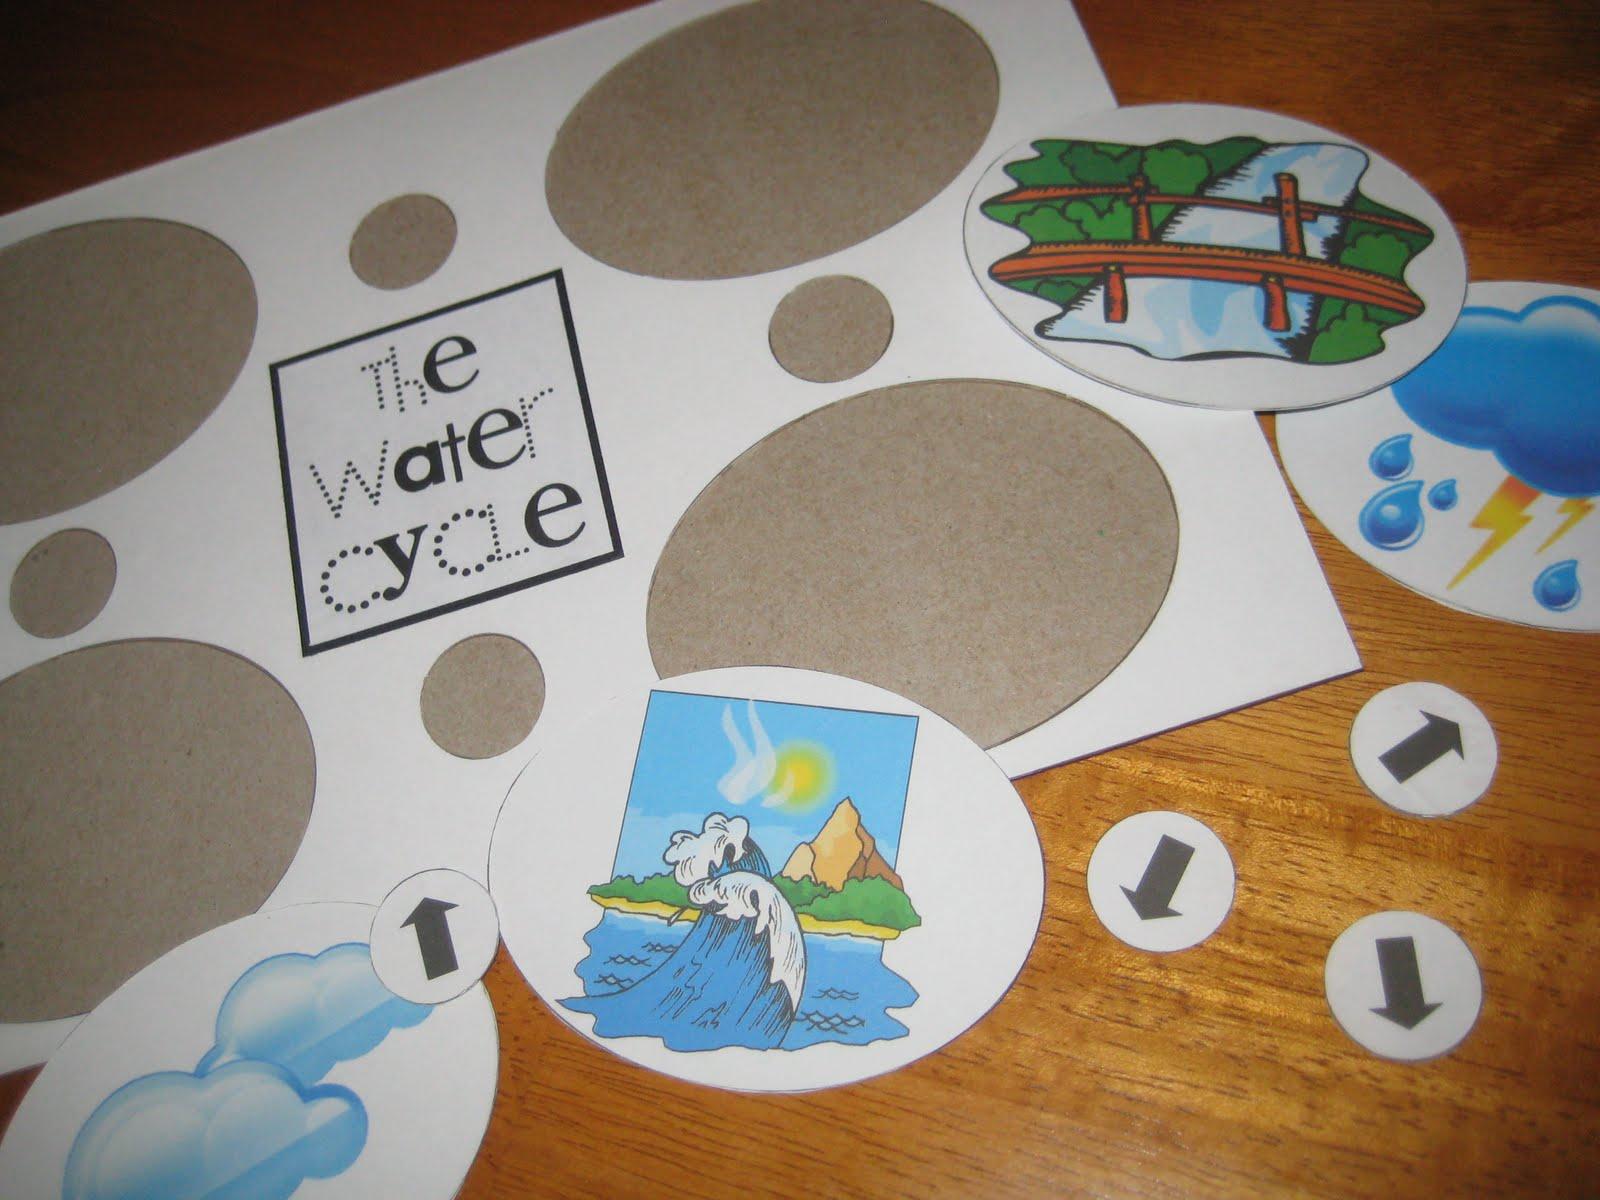 ... Salitang Ugat Worksheet For Grade 2 | Free Download Printable